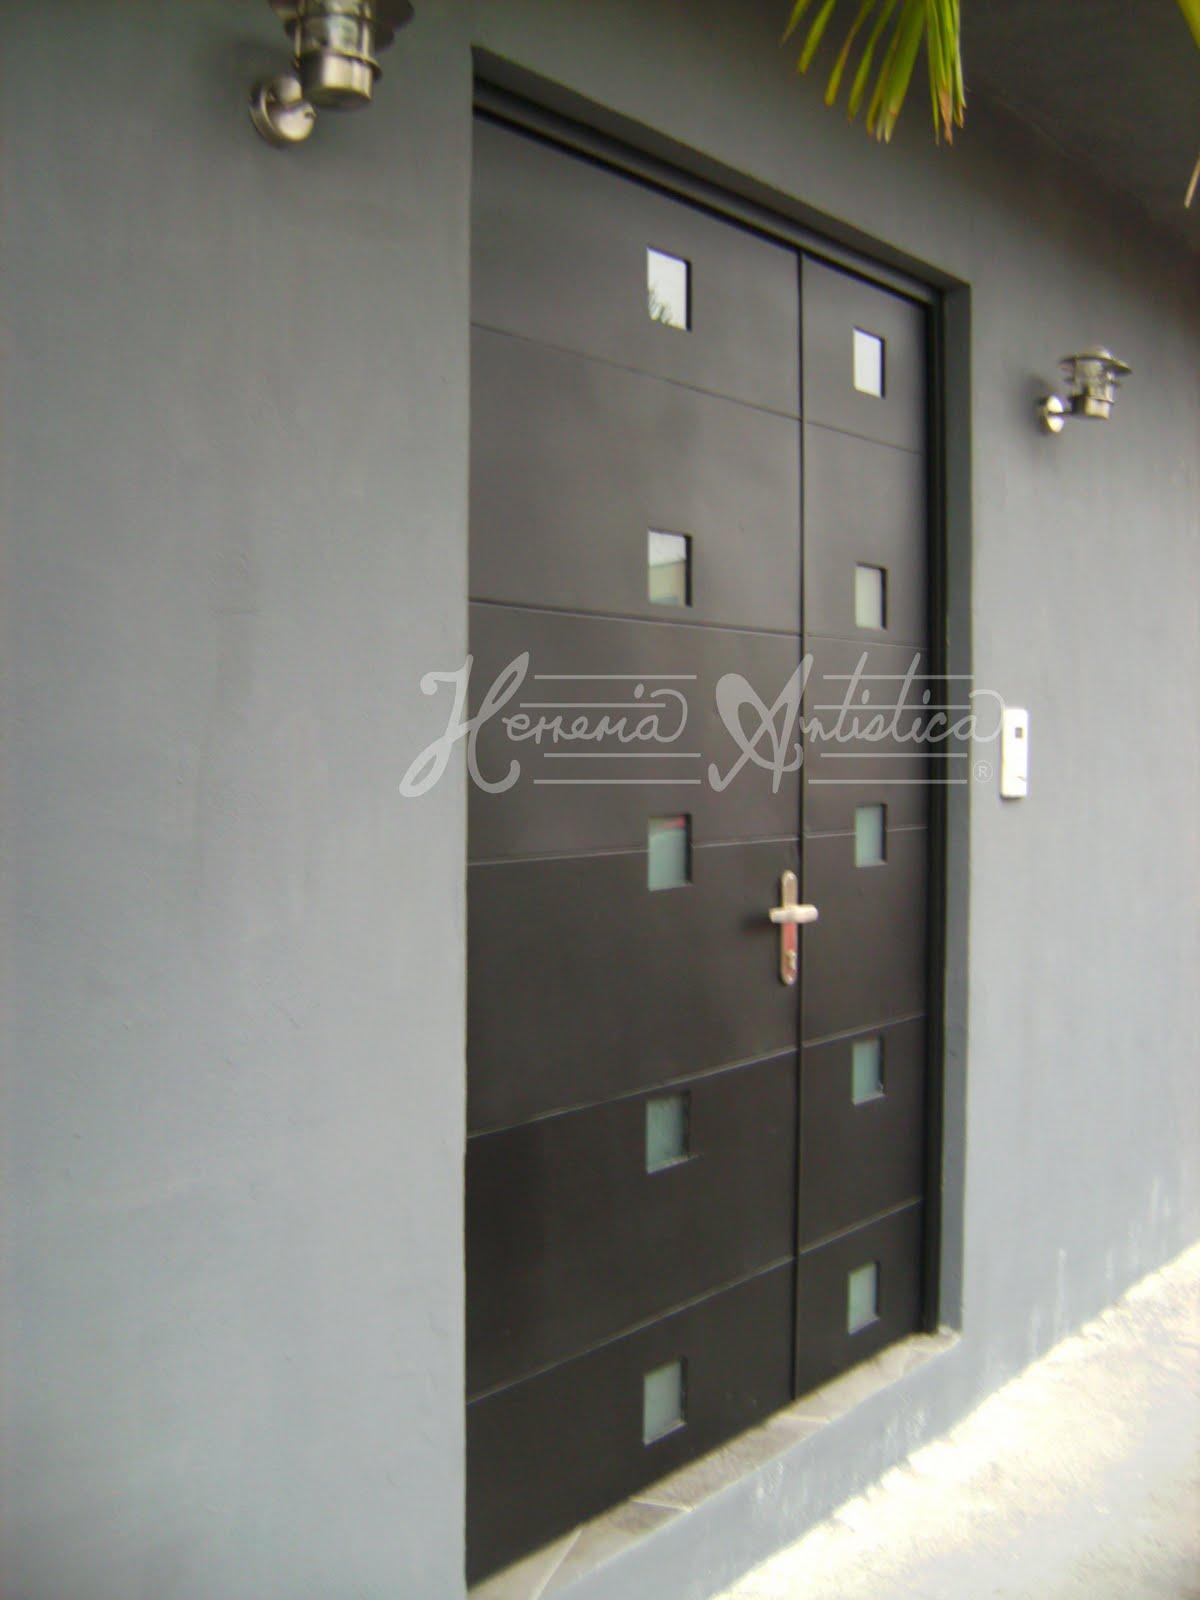 Puertas contemporaneas puertas contemporaneas herreria for Fotos de puertas de metal